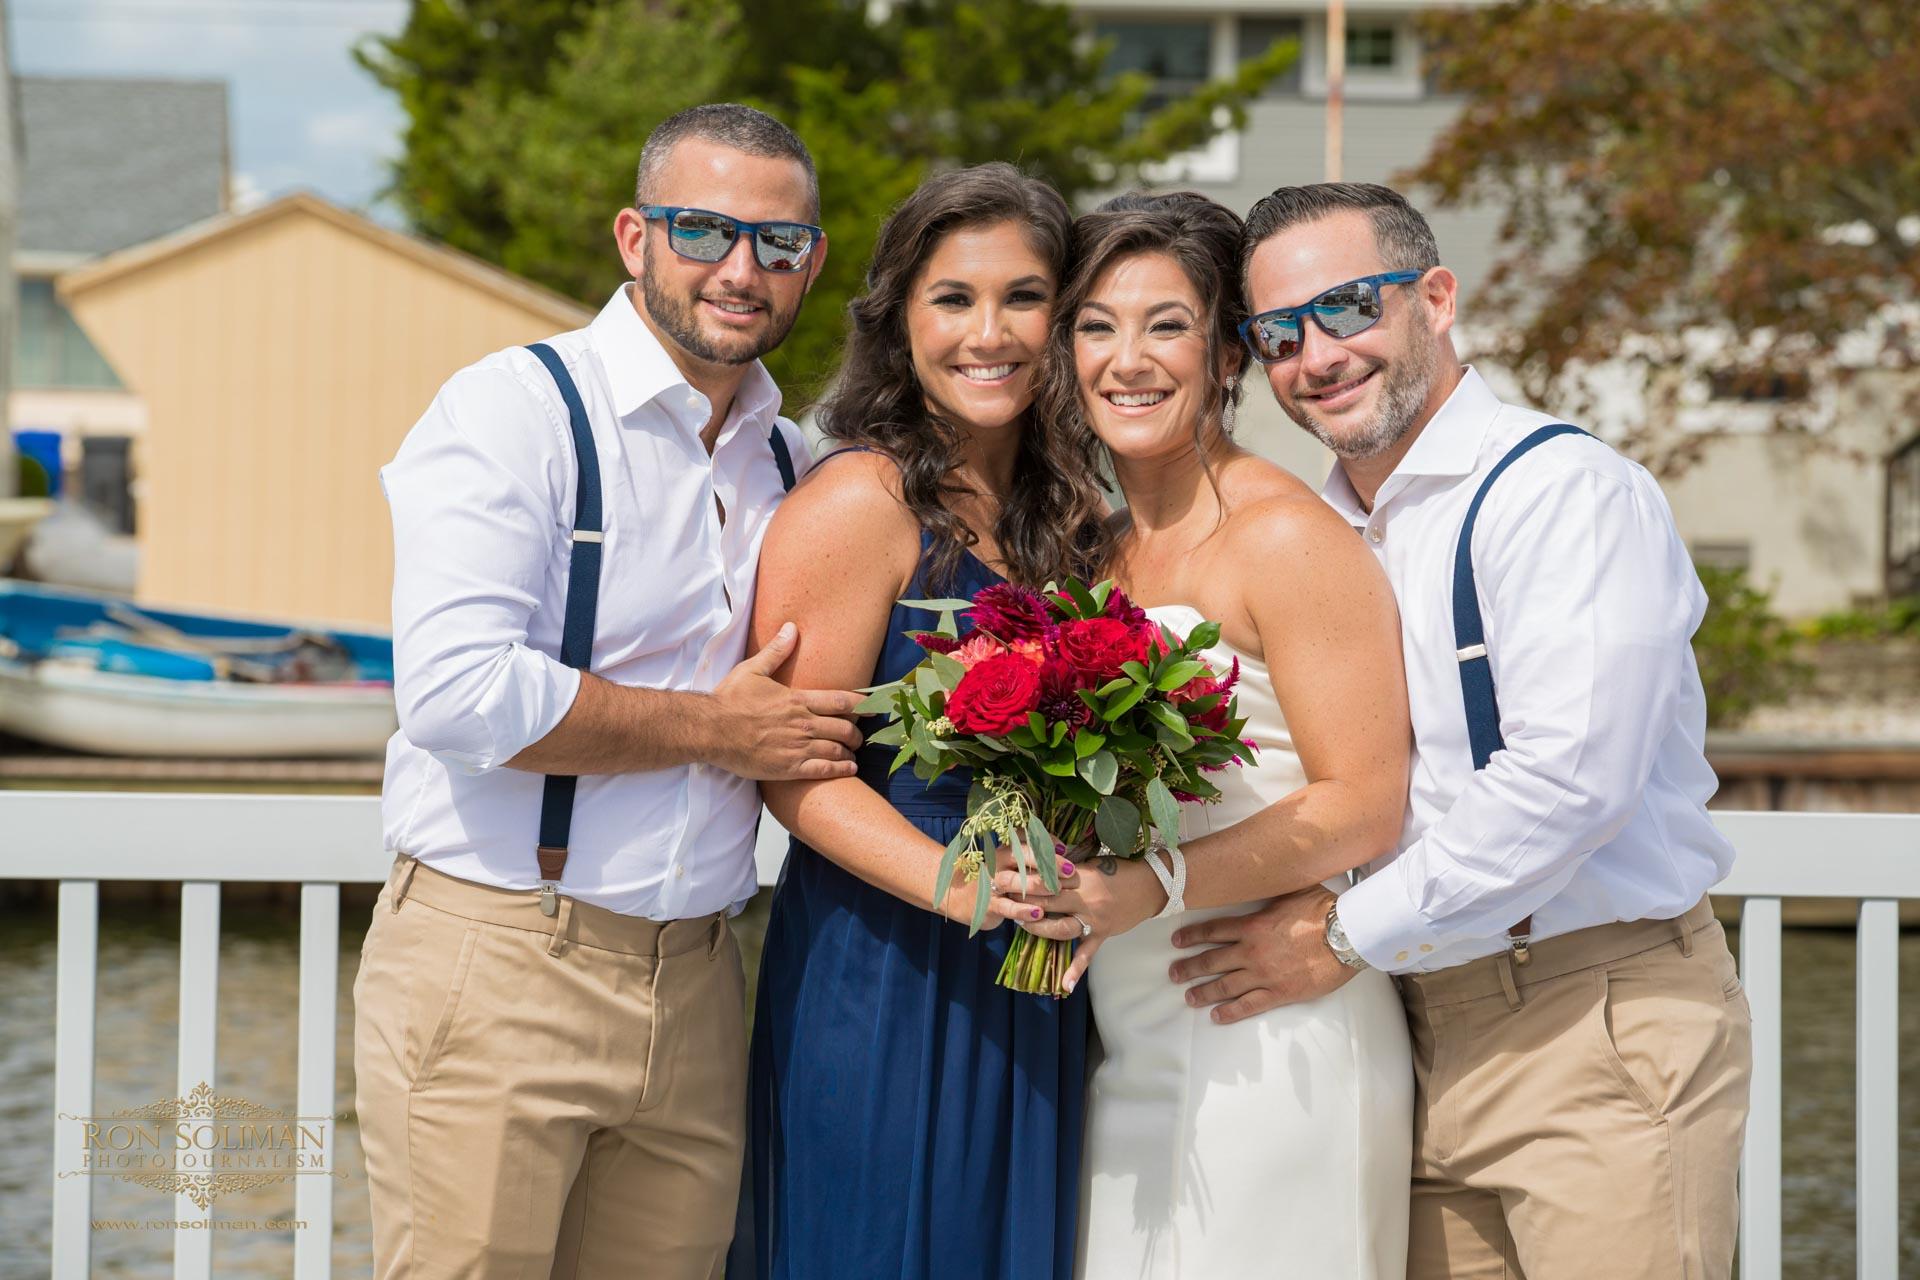 NEW JERSEY BEACH WEDDING 9